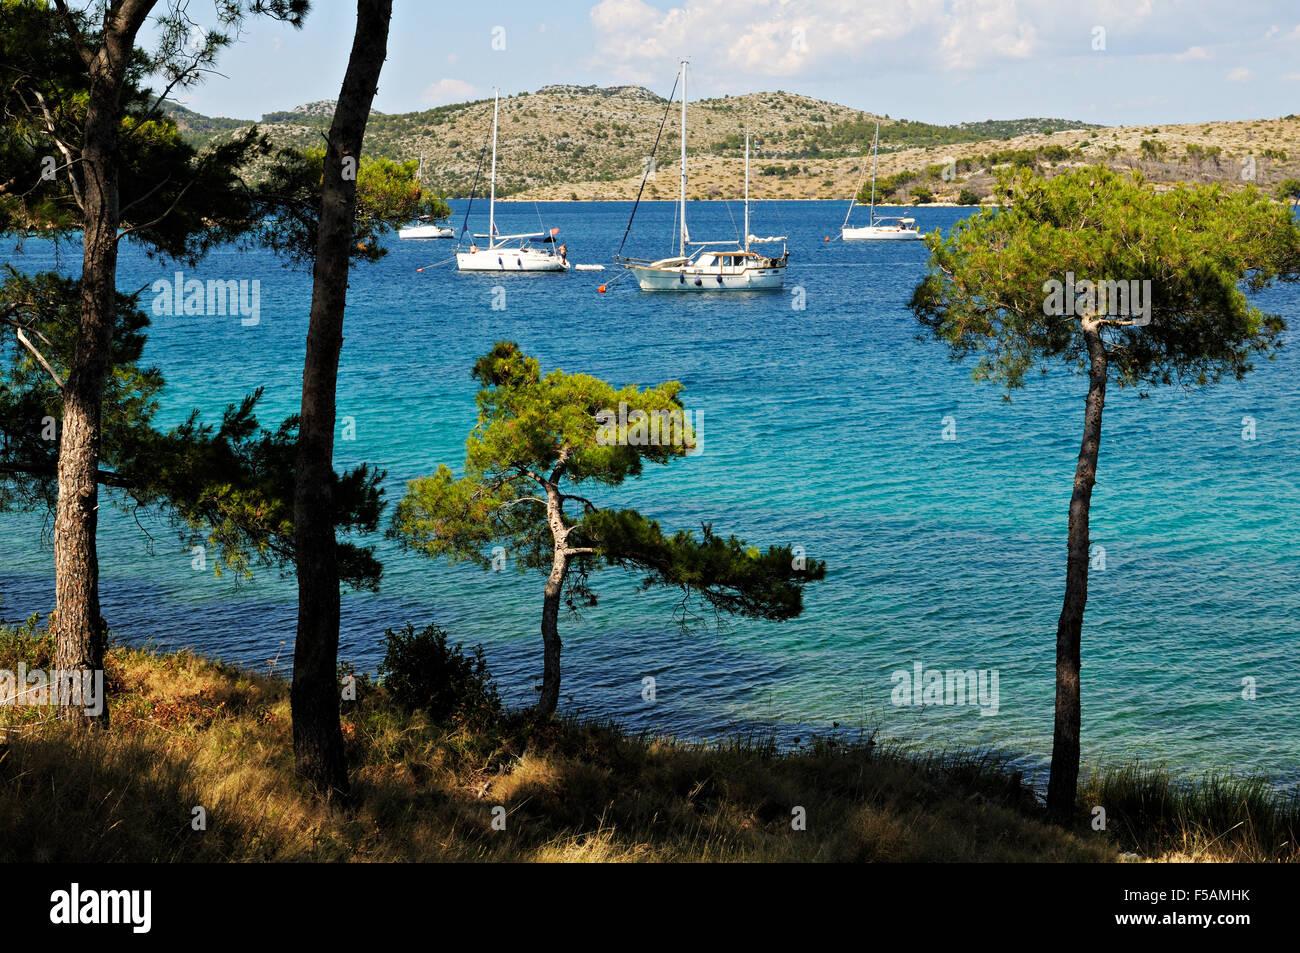 Leisure boats anchored in Nature Park Telascica, a natural bay in Dugi Otok, Zadar County, Croatia - Stock Image